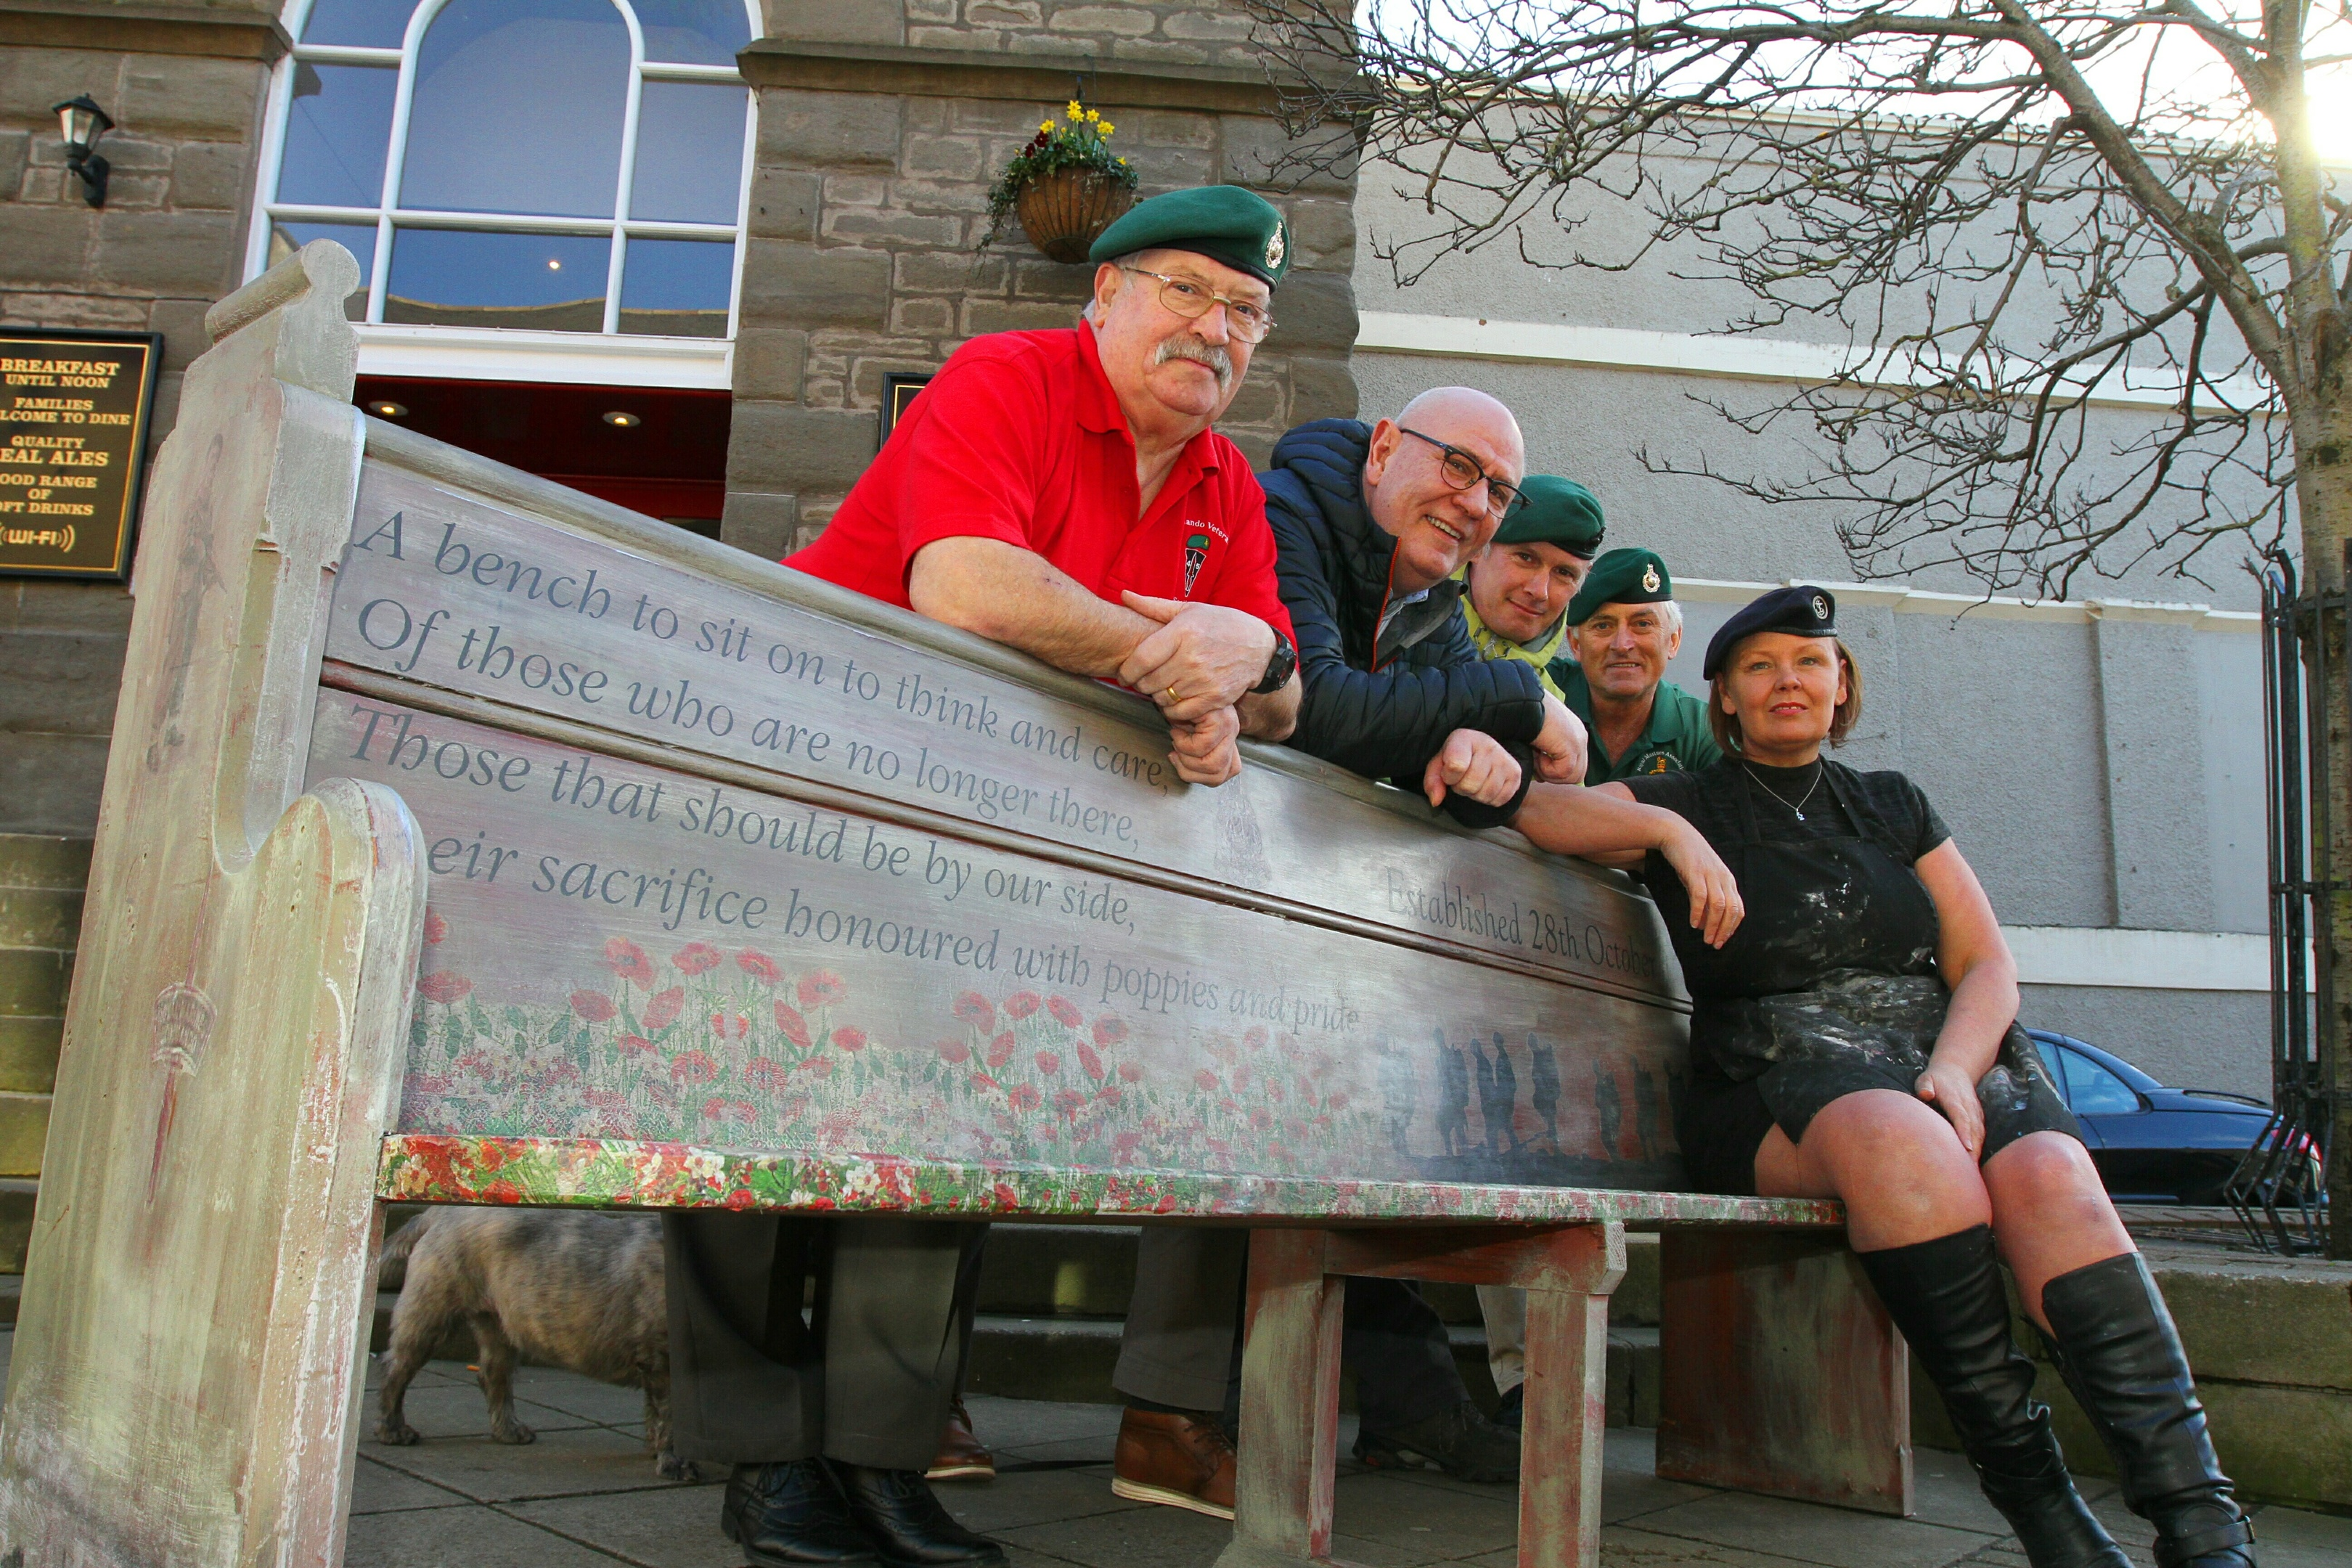 418d1b411b7 DC Thomson Fiona with former serving Royal Marines, David McKaig, Robert  Alan McGregor Harris, Paul